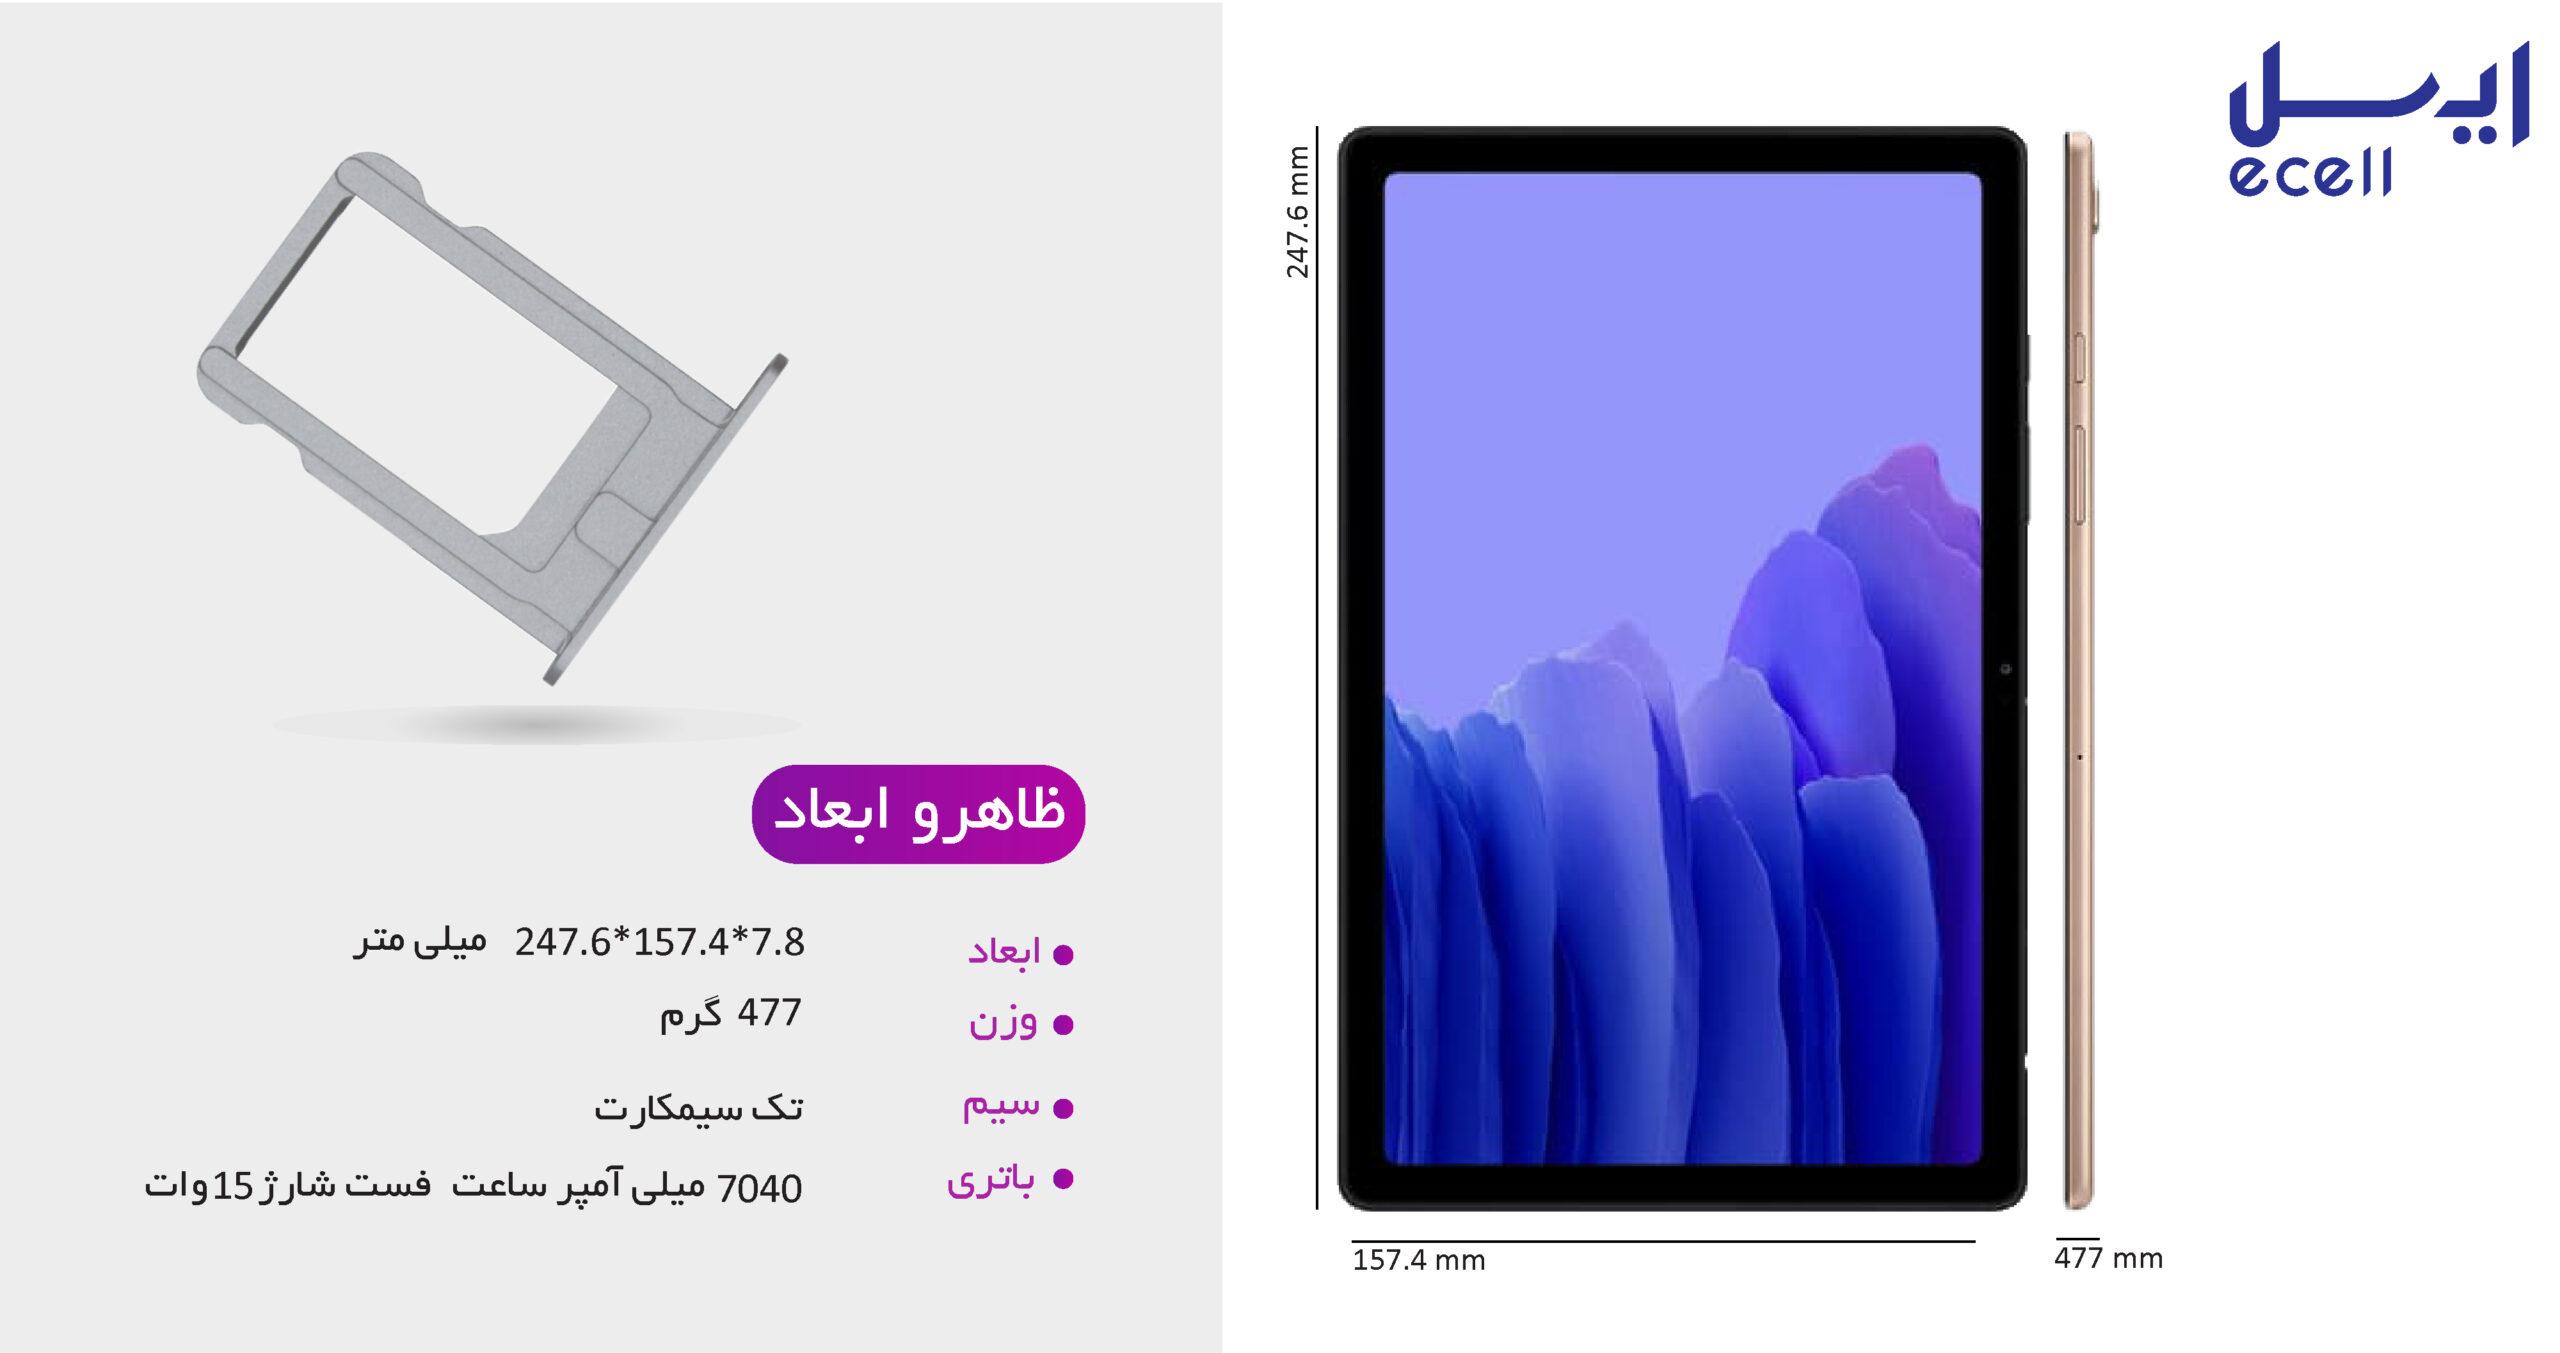 طراحی ظاهری تبلت سامسونگ A7 10.4